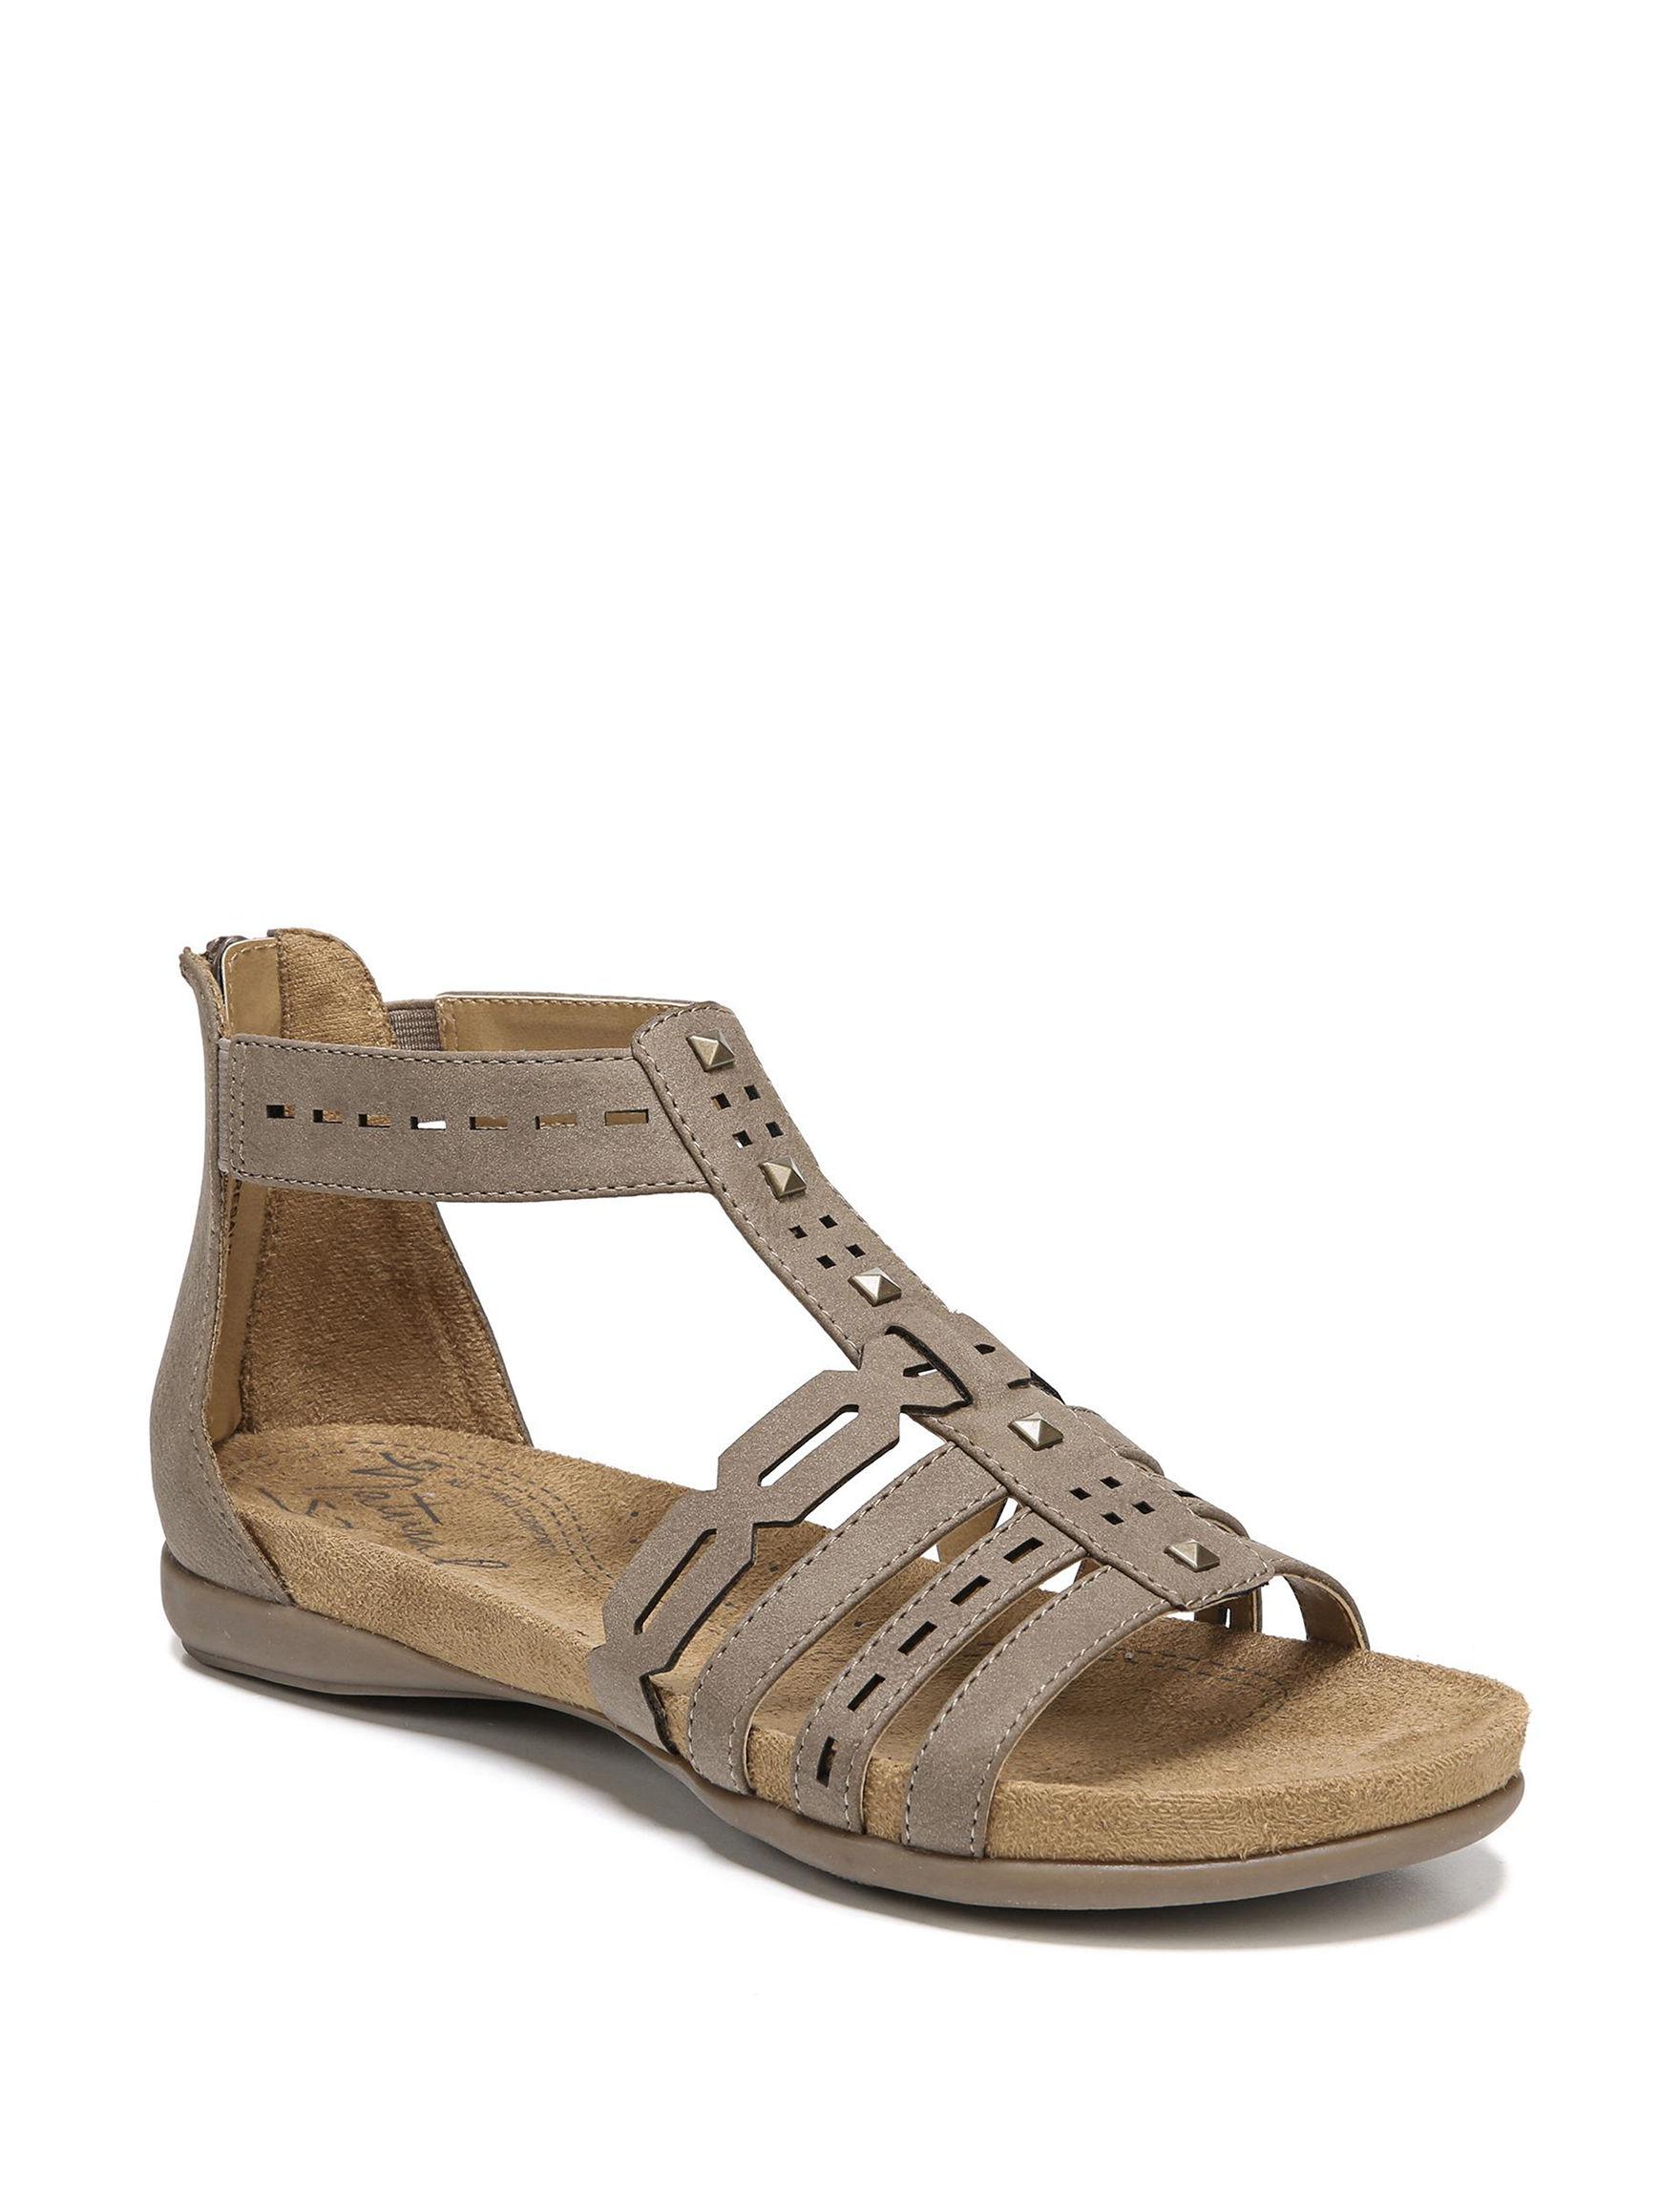 Natural Soul Mushroom Flat Sandals Gladiators Comfort